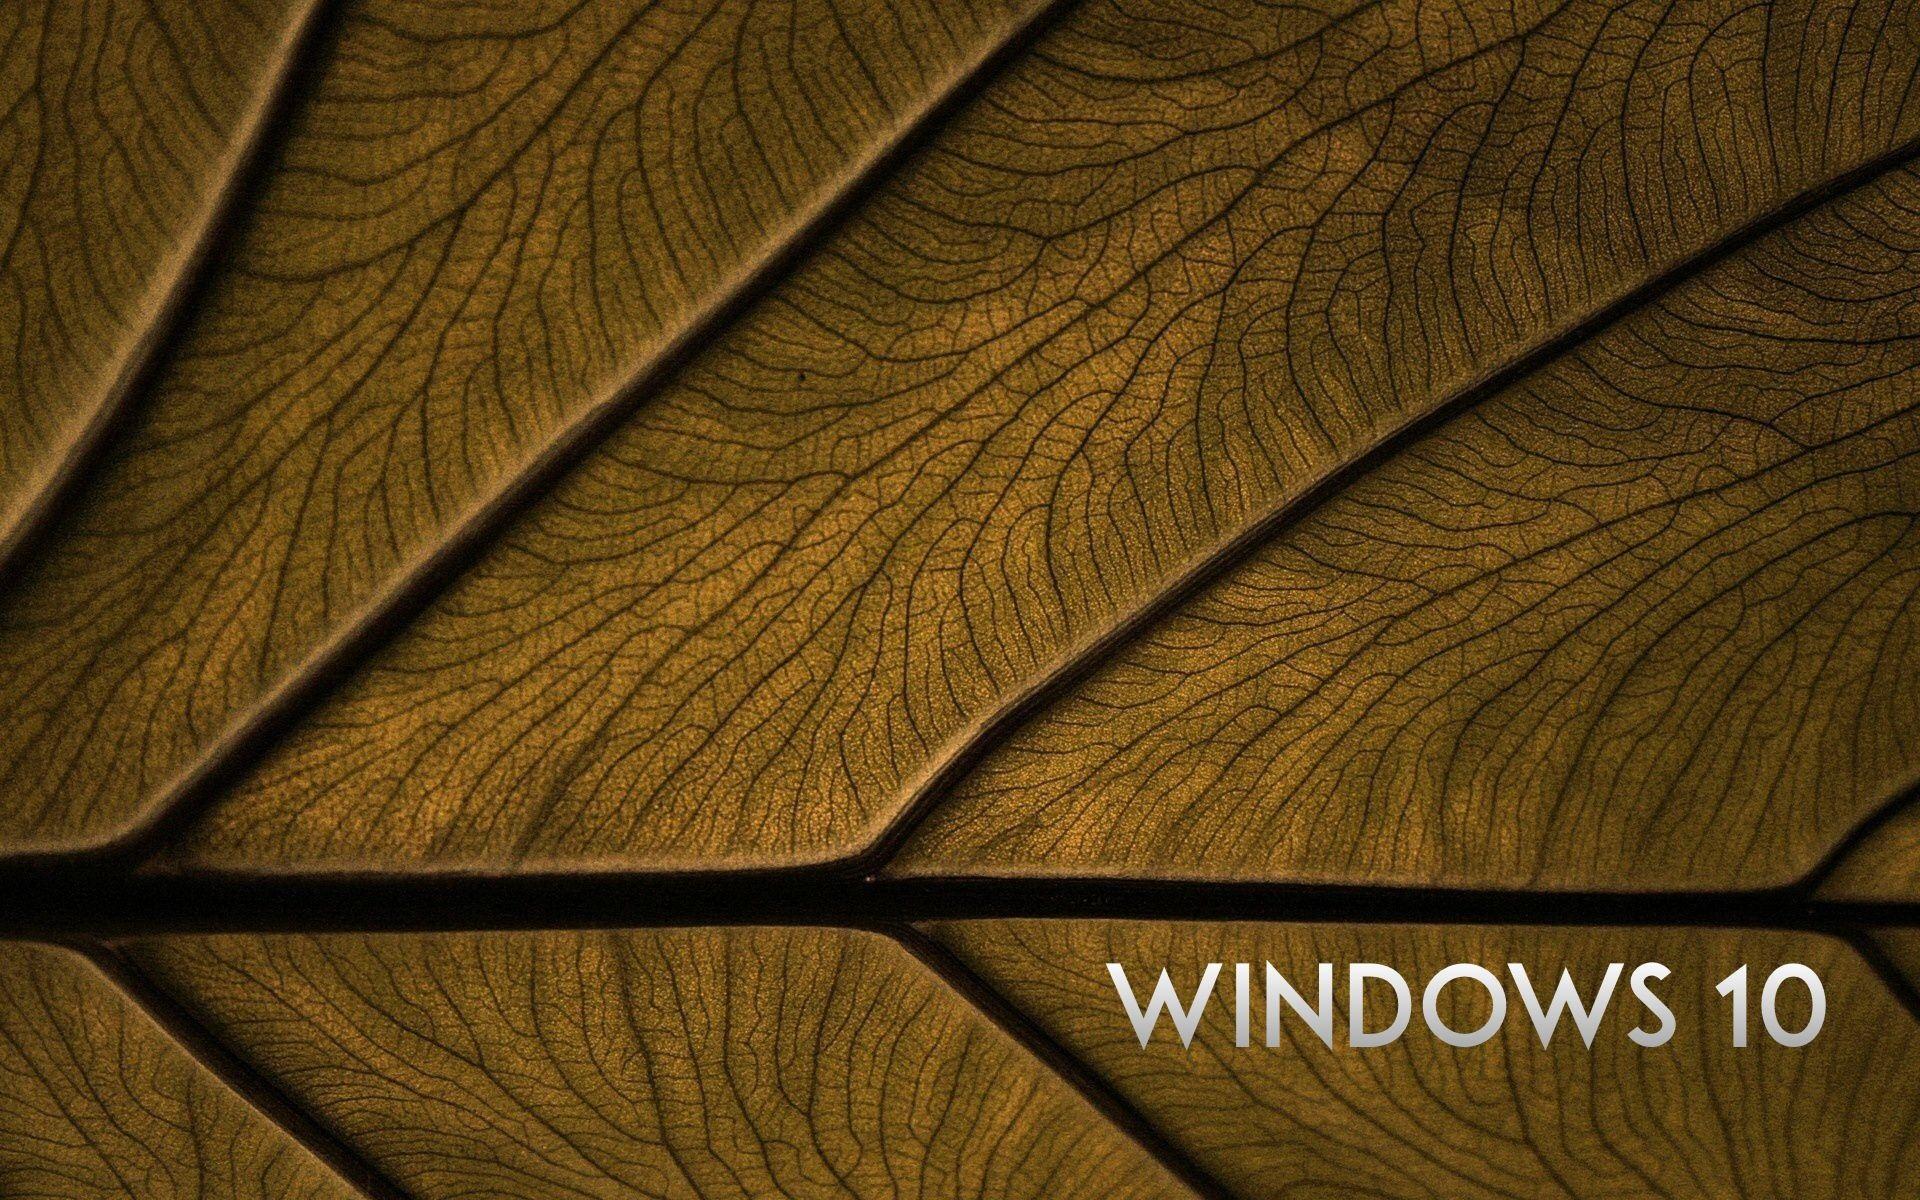 10 system leaf background wallpaper 1920x1200 description windows 10